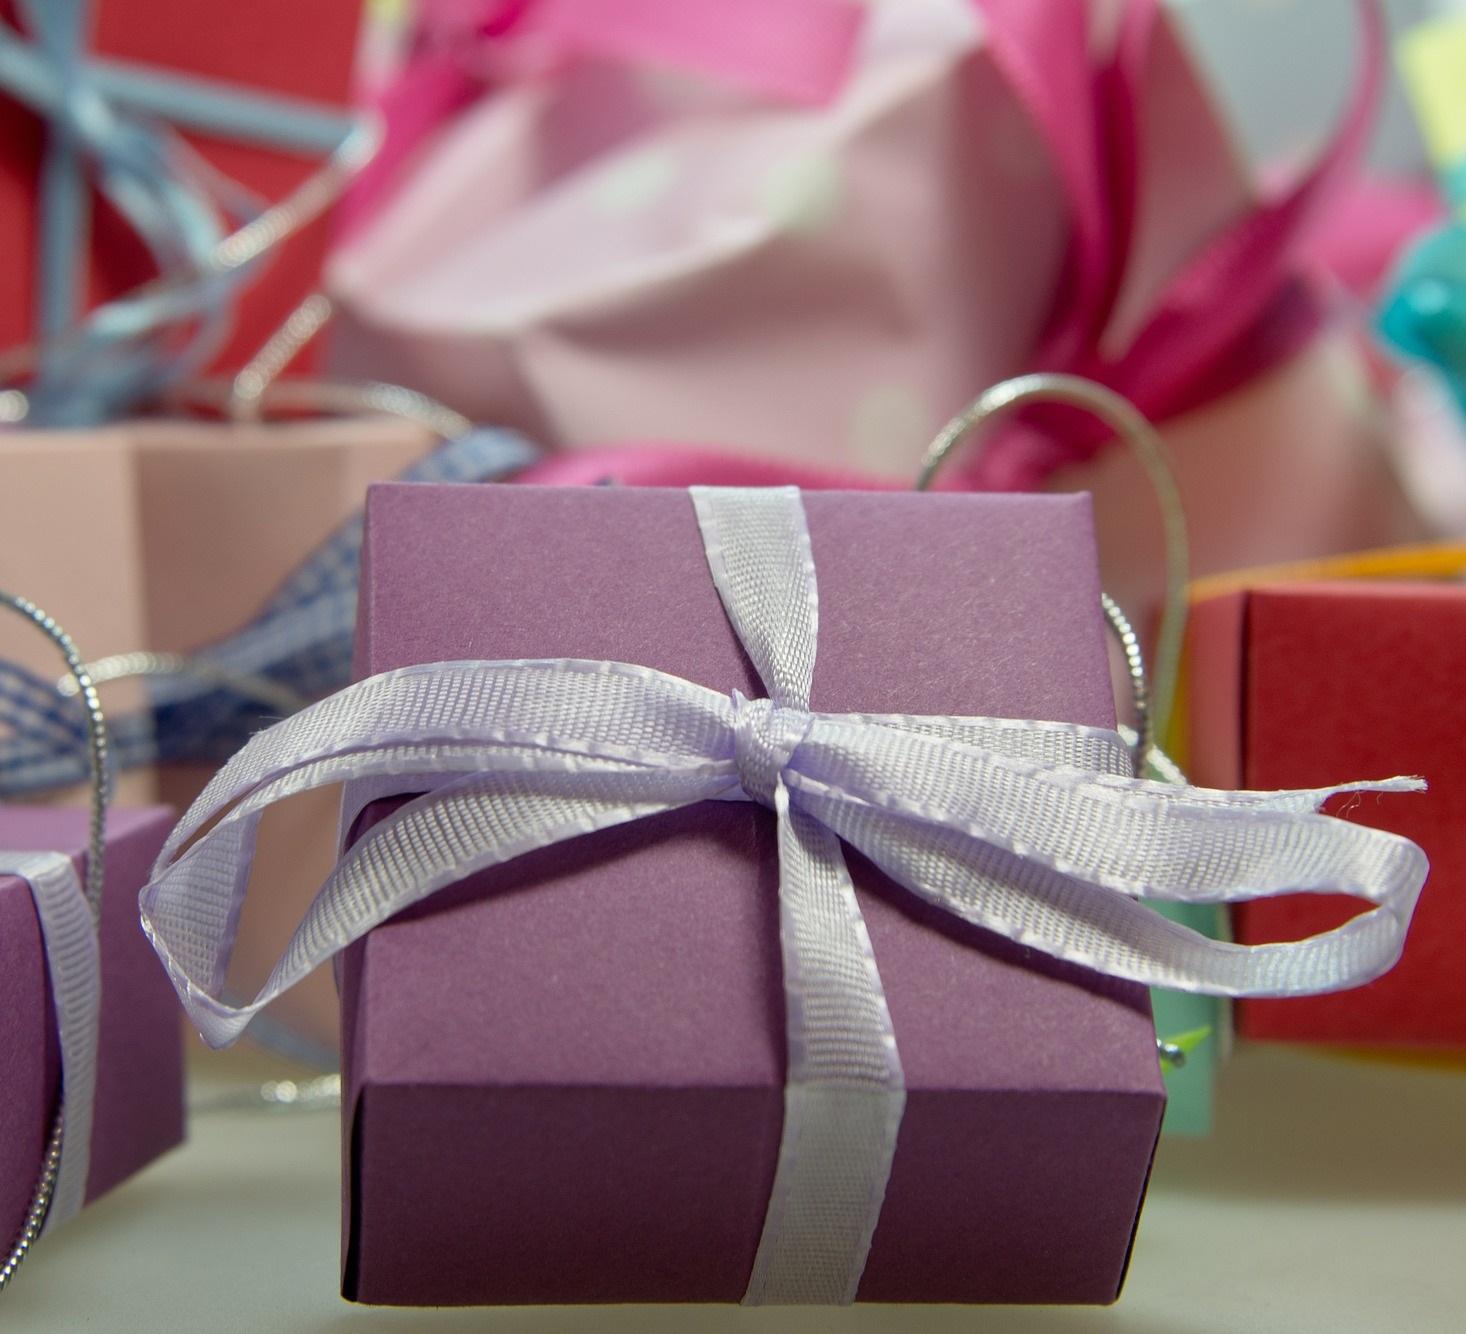 Bon cadeau - Brigitte MOREL - Naturopathe - Reflexologue plantaire